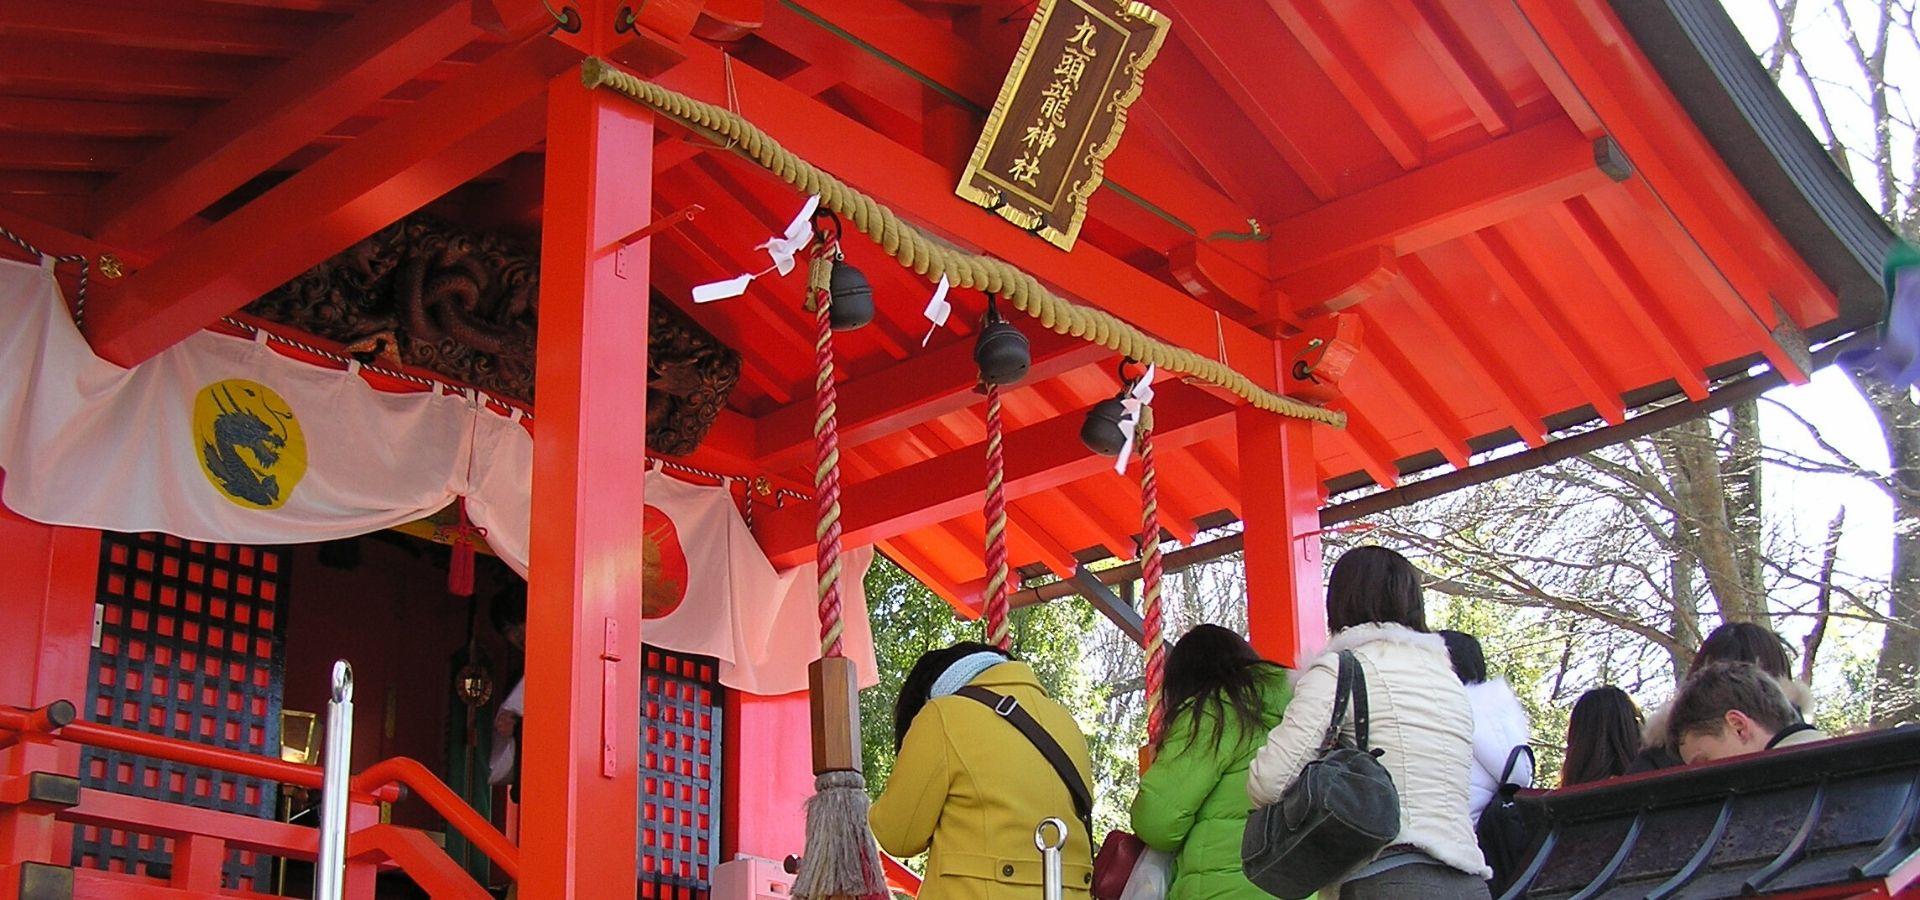 The forest of Hakone Kuzuryu no Mori